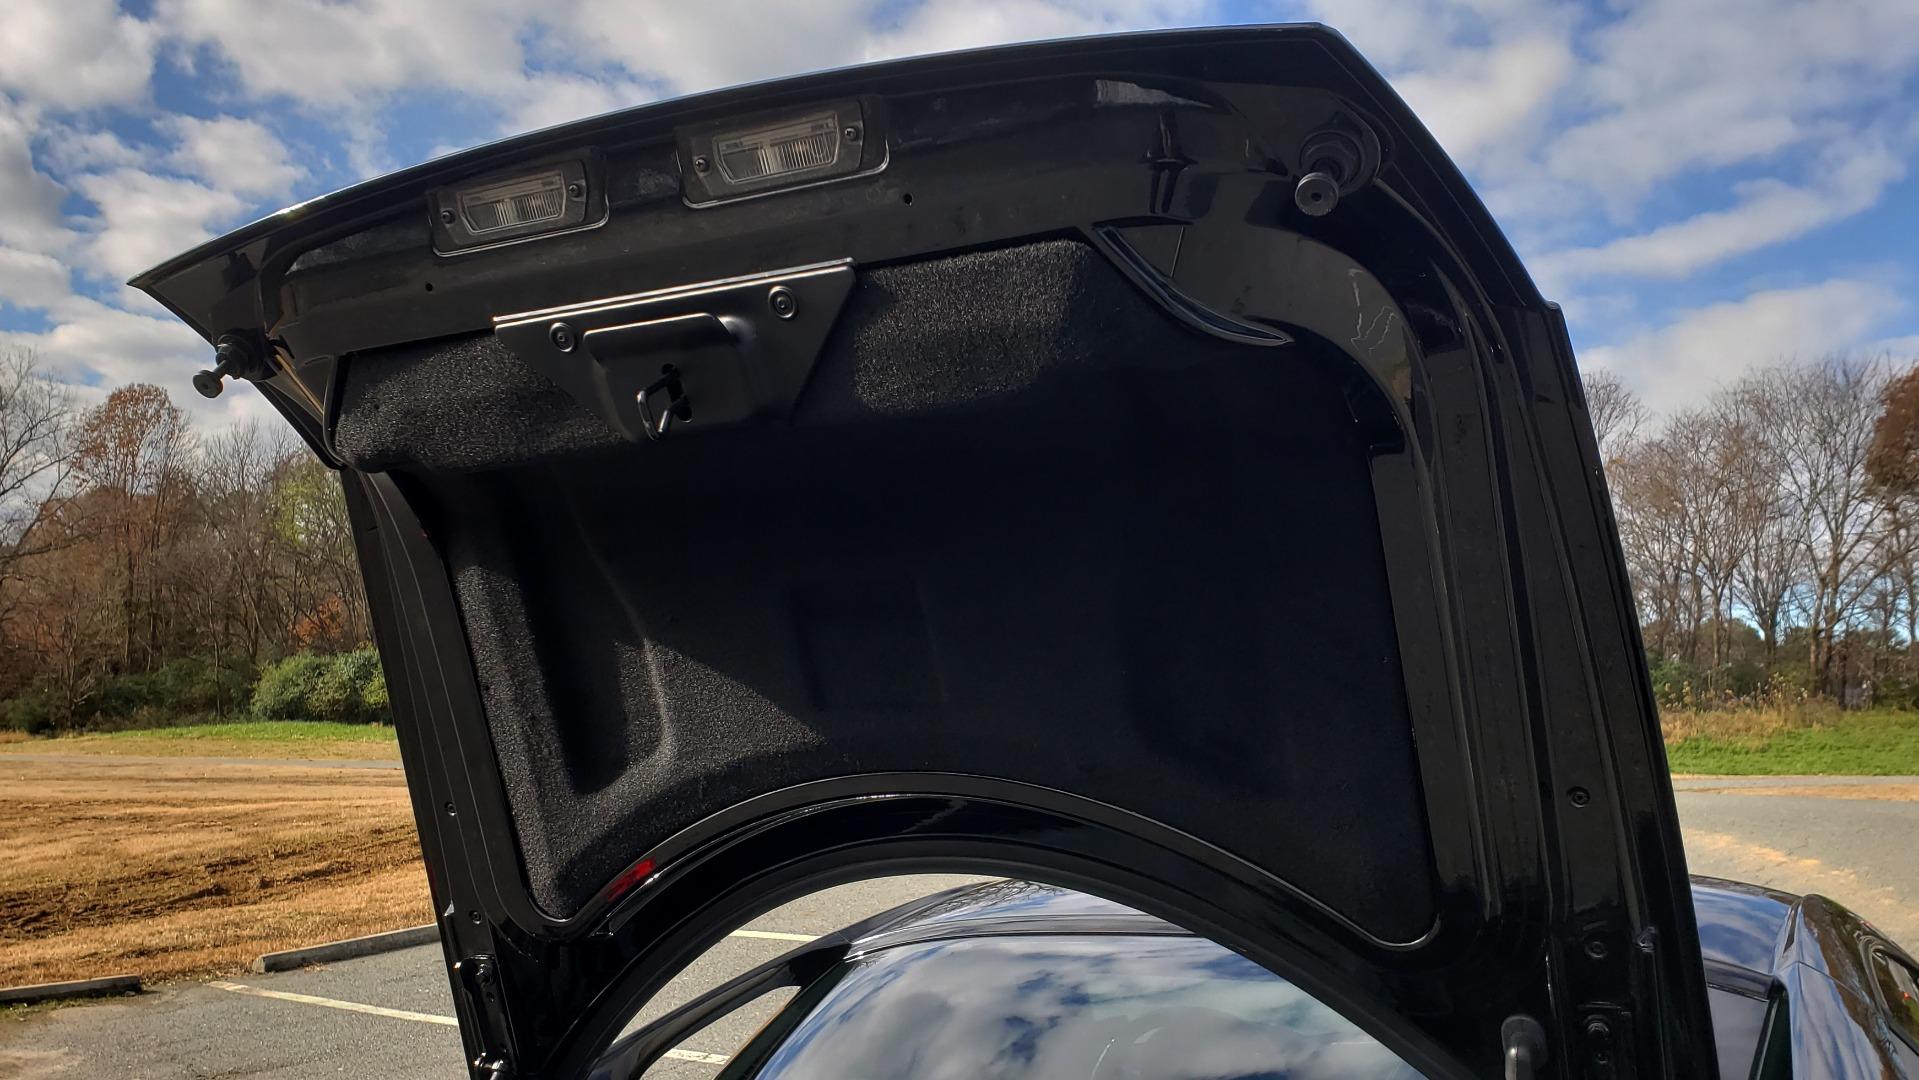 Used 2007 Ferrari 599 GTB FIORANO HGTE / V12 / F1 TRANS / NAV / BOSE / CUSTOM WHEELS for sale $109,999 at Formula Imports in Charlotte NC 28227 72